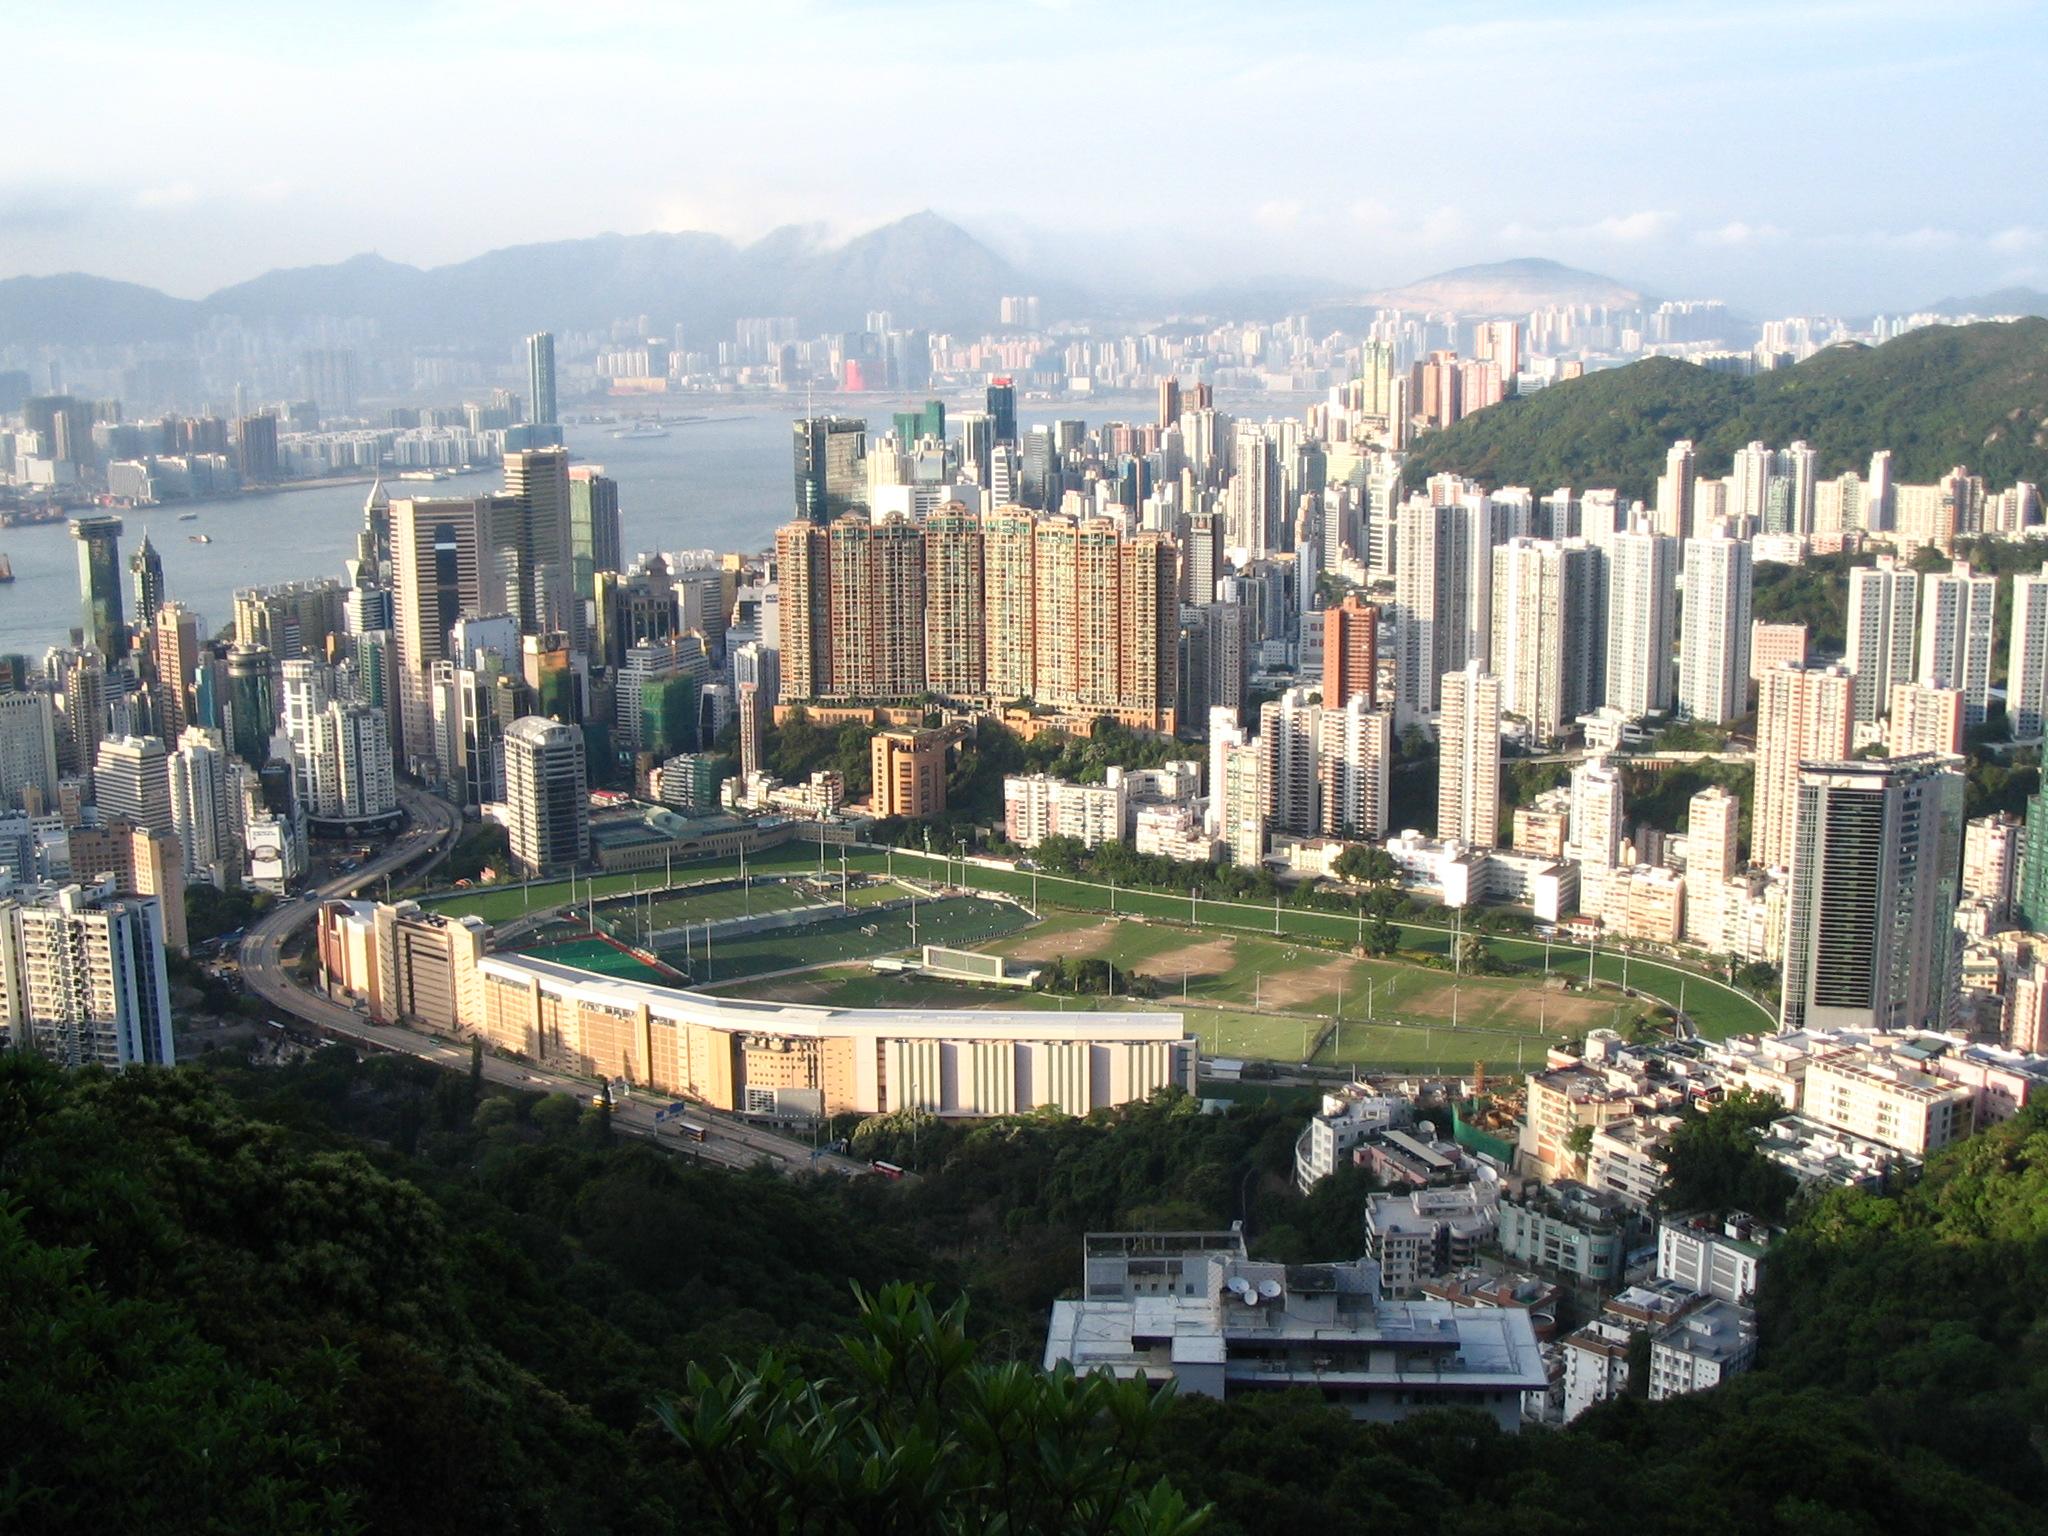 Happy Valley Racecourse in Hong Kong.